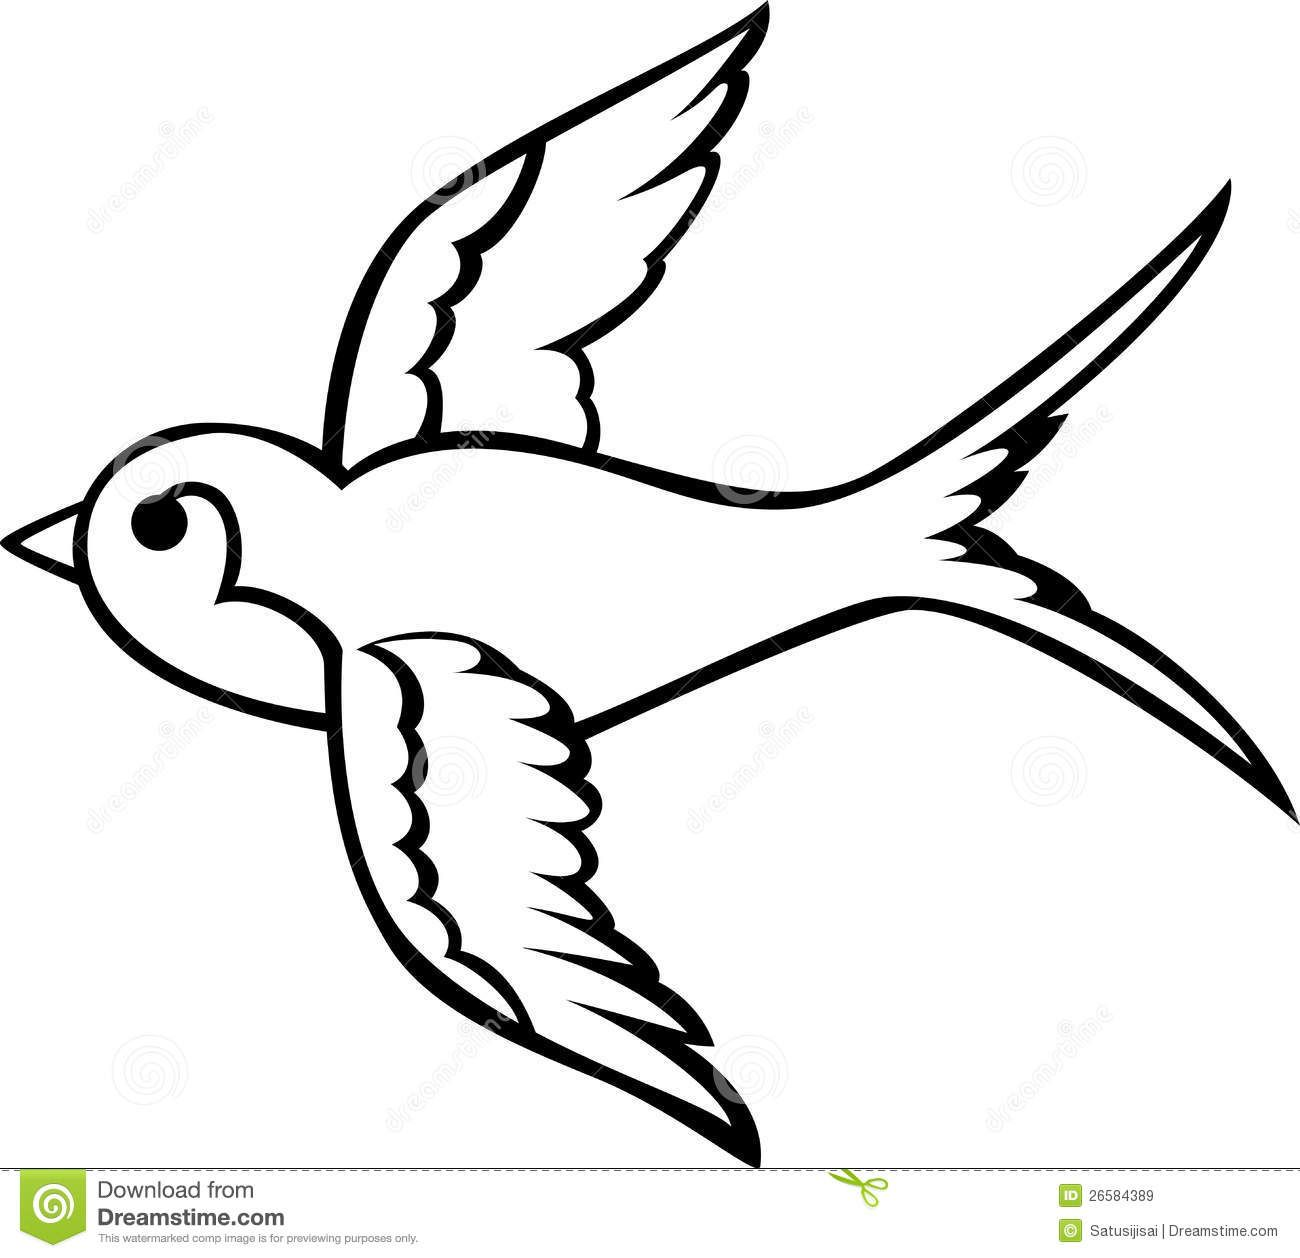 Swallow Bird Drawing Google Search Swallow Bird Tattoos Bird Outline Tattoo Bird Outline